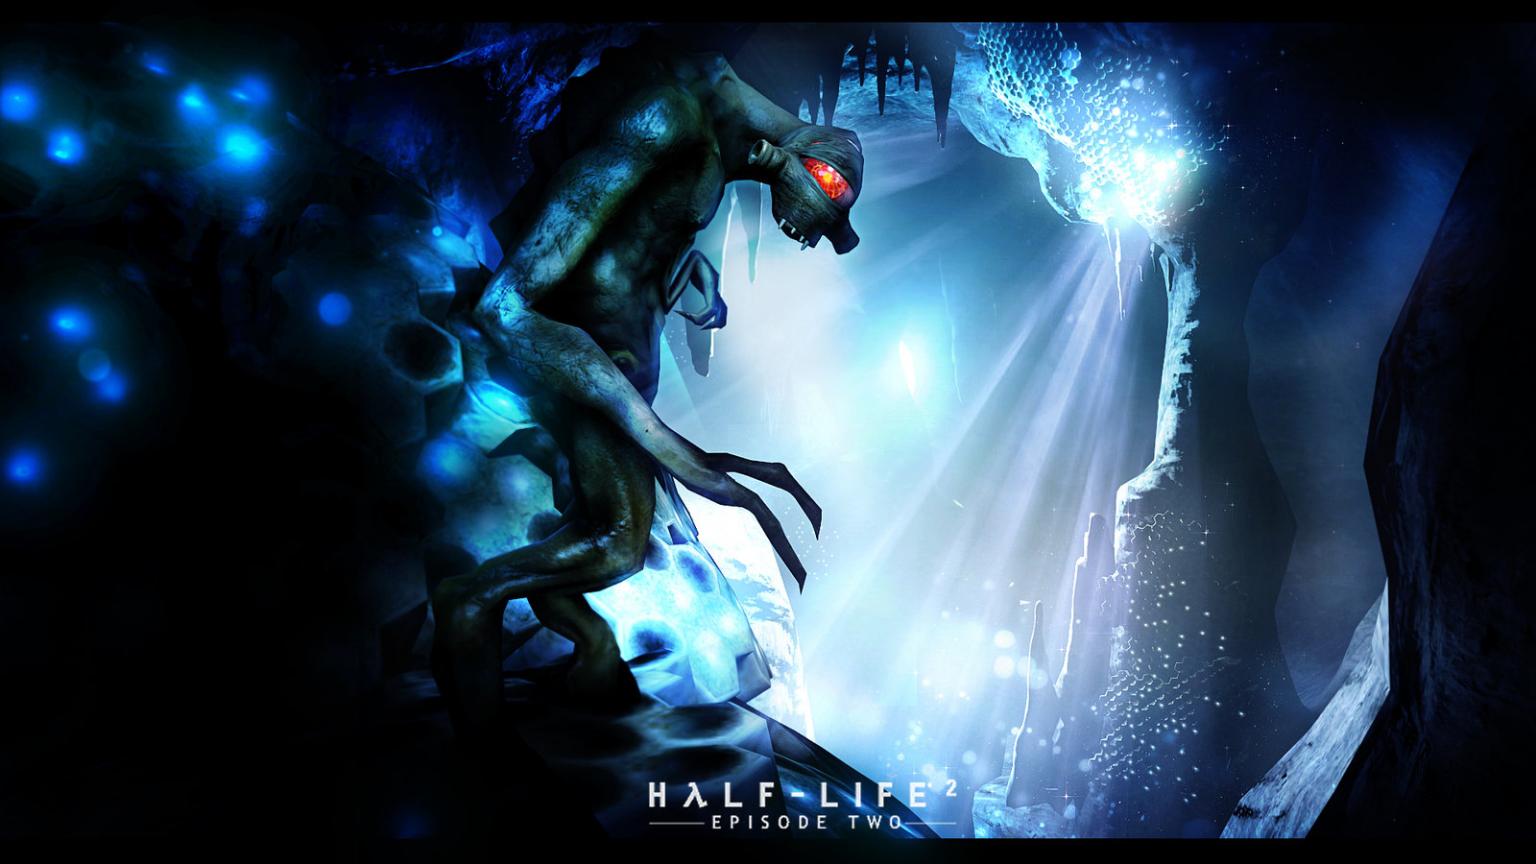 Free Download Half Life 2 Episode 2 By Sallibyg Ray Fan Art